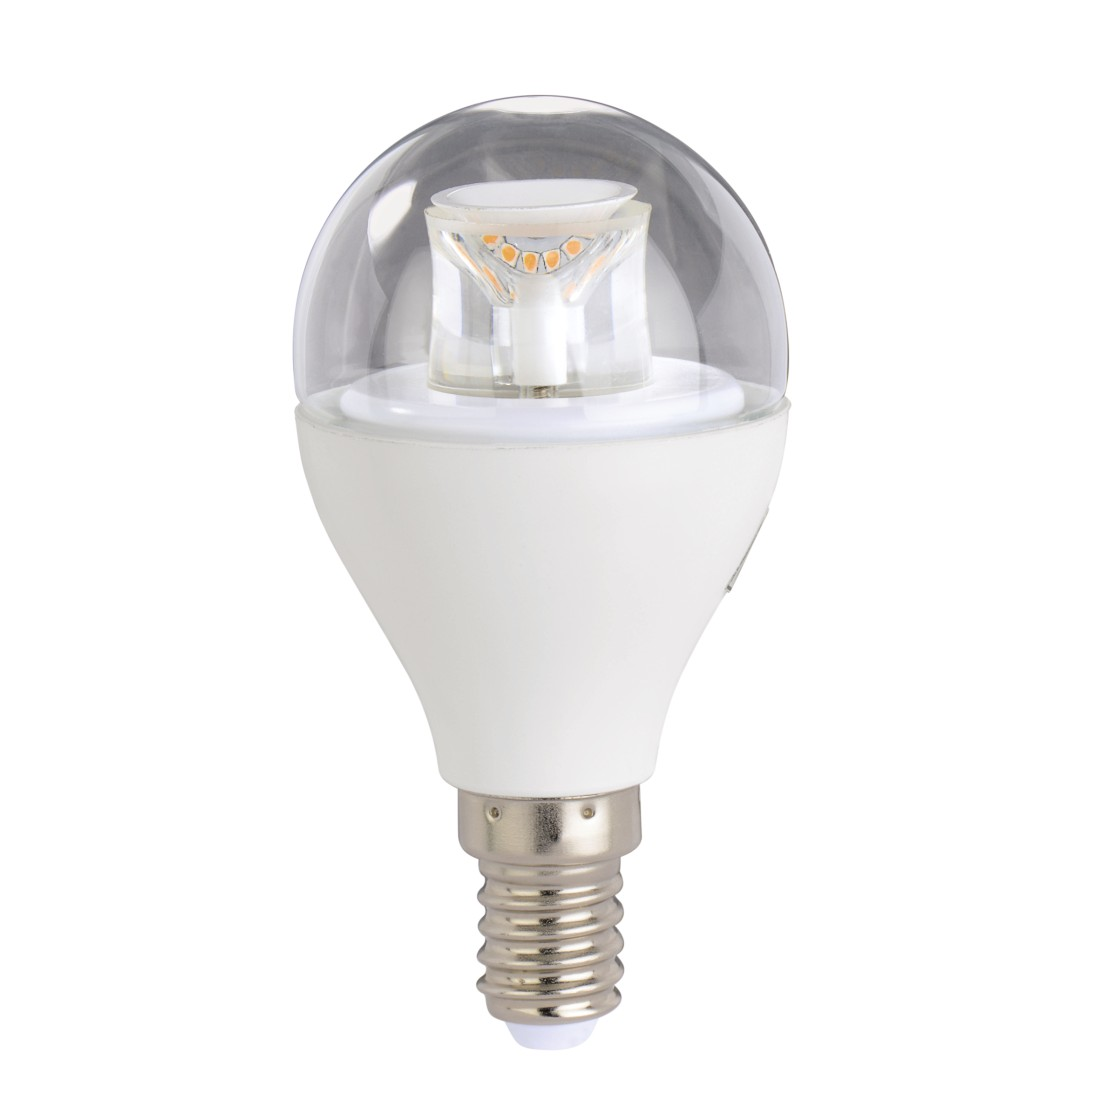 00112173 xavax led lampe e14 470lm ersetzt 40w tropfenlampe warmwei dimmbar. Black Bedroom Furniture Sets. Home Design Ideas